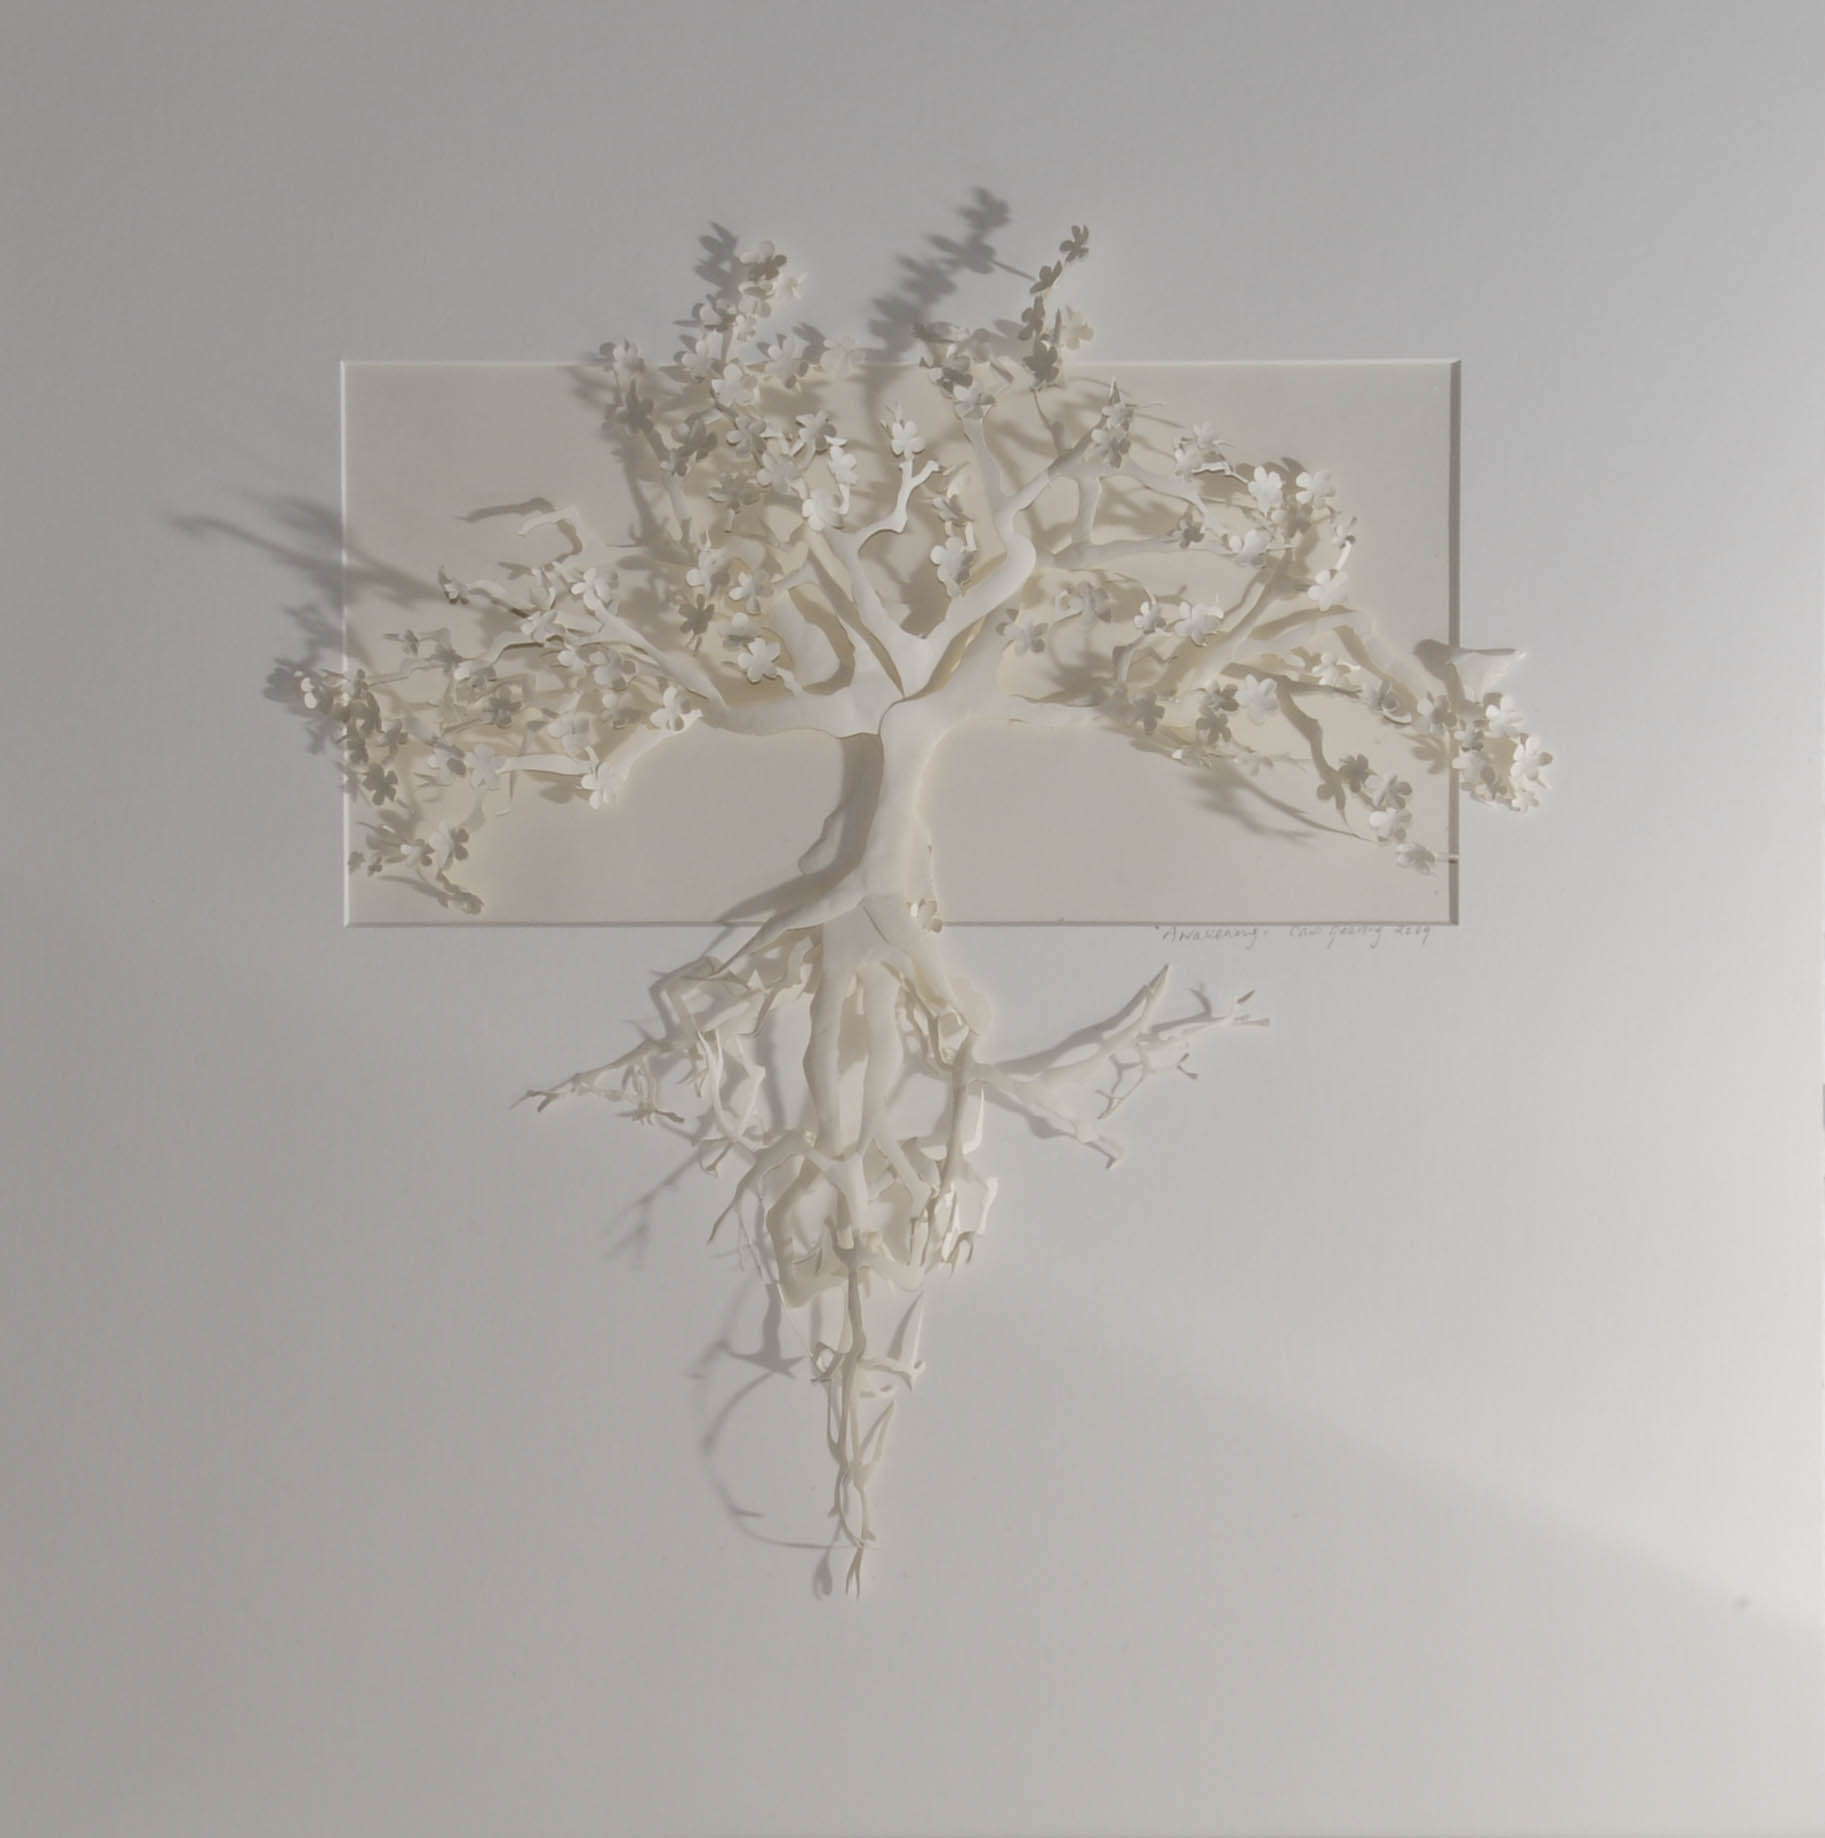 tree-awakening-2